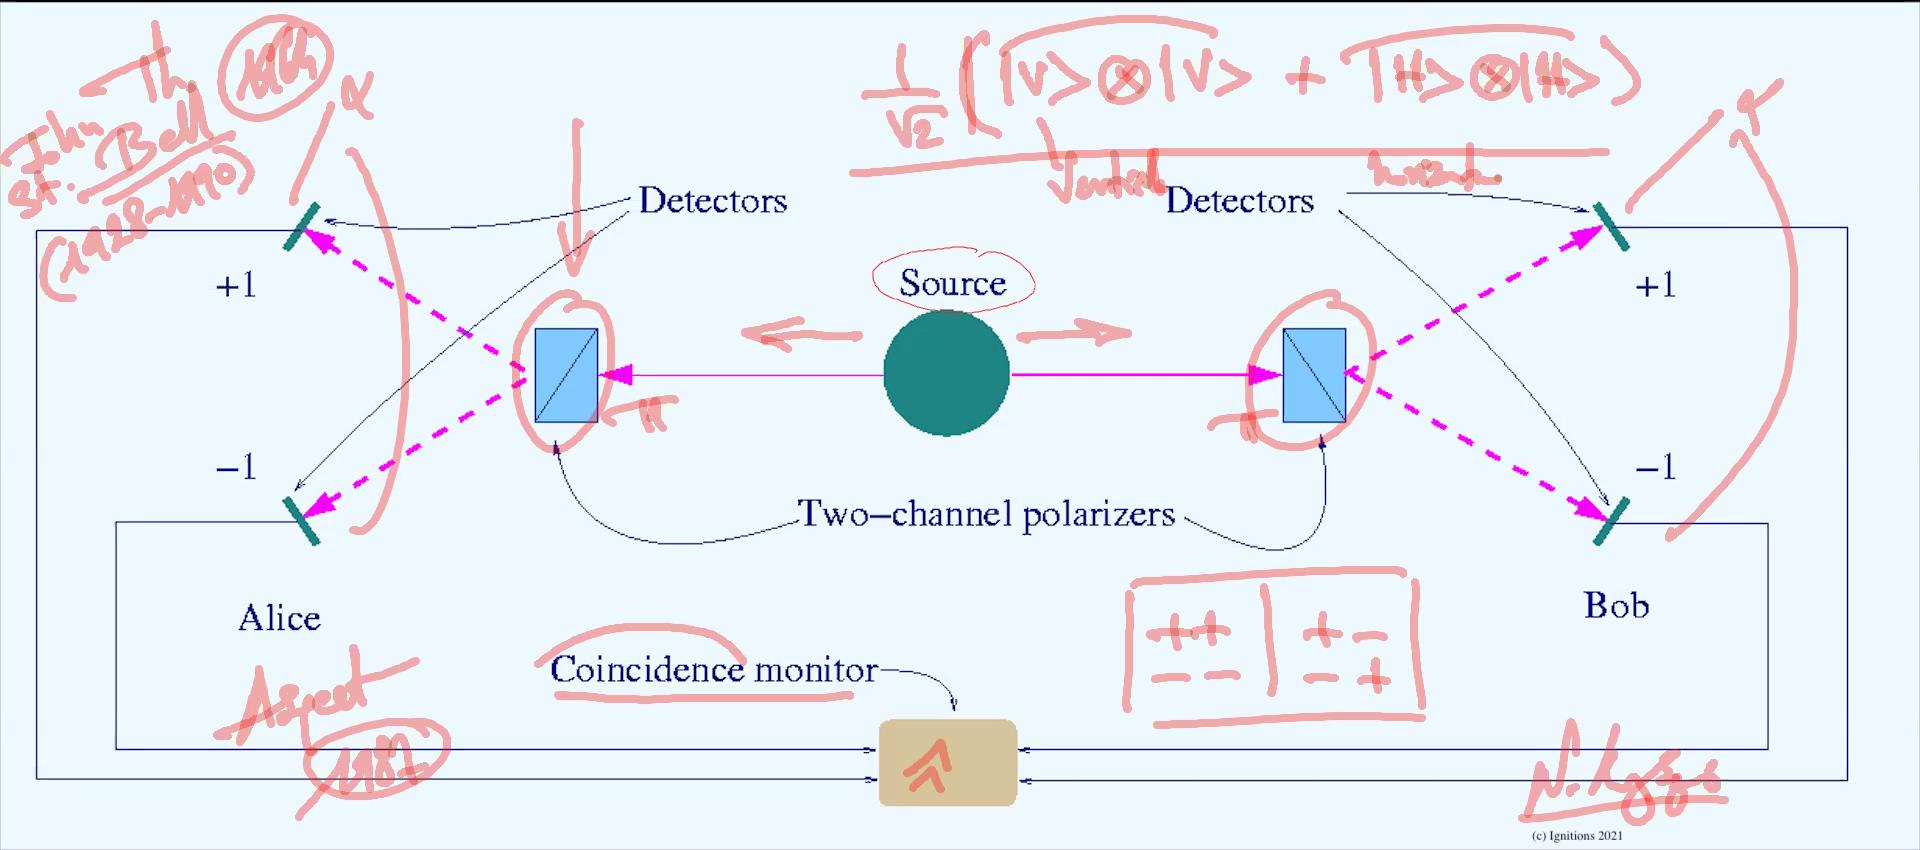 58388 - III - e-Μάθημα: Ερμηνεία Πολλαπλών Κόσμων, Παράδοξο EPR και θεώρημα Bell. (Dessin)